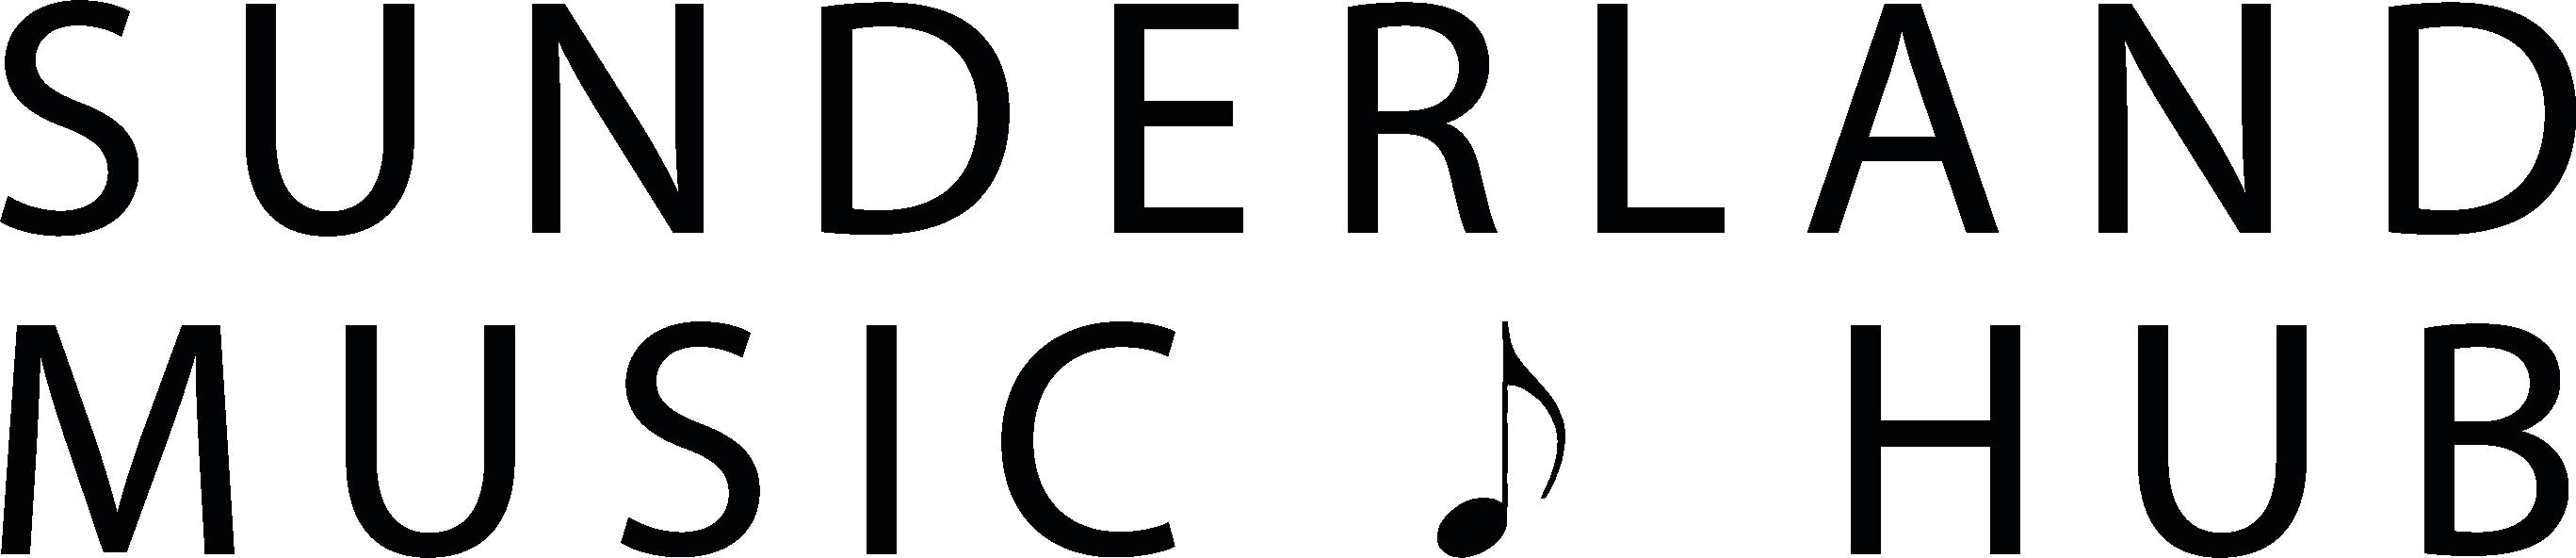 Sunderland music hub logo